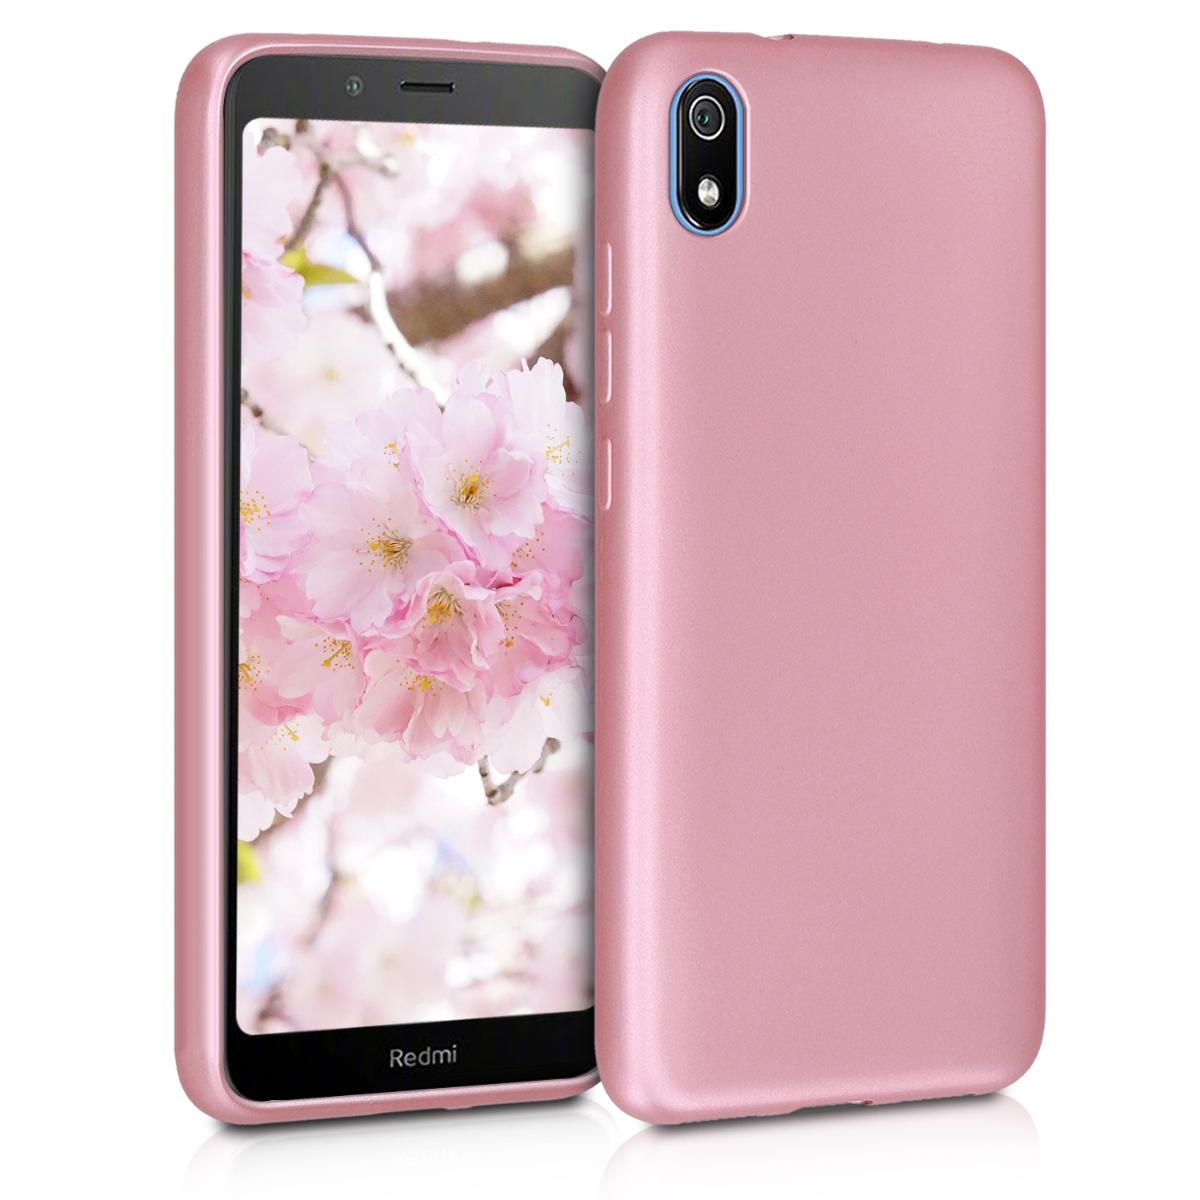 KW Θήκη Σιλικόνης Xiaomi Redmi 7A - Metallic Rose Gold (49233.31)